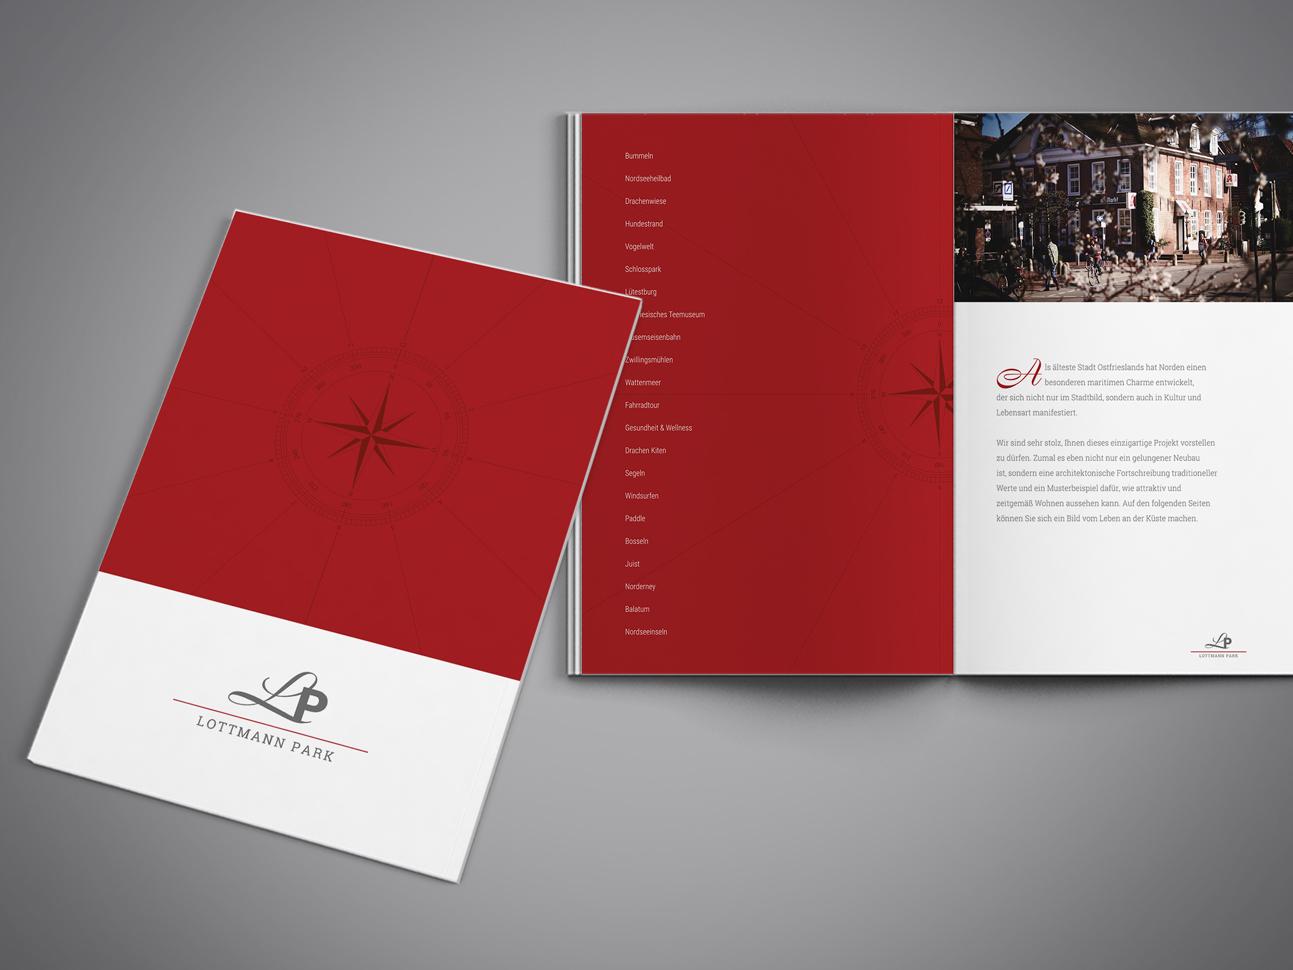 martin_zech_design_projekt_design_lottmann-park_verkaufsprospekt_cover_doppelseite